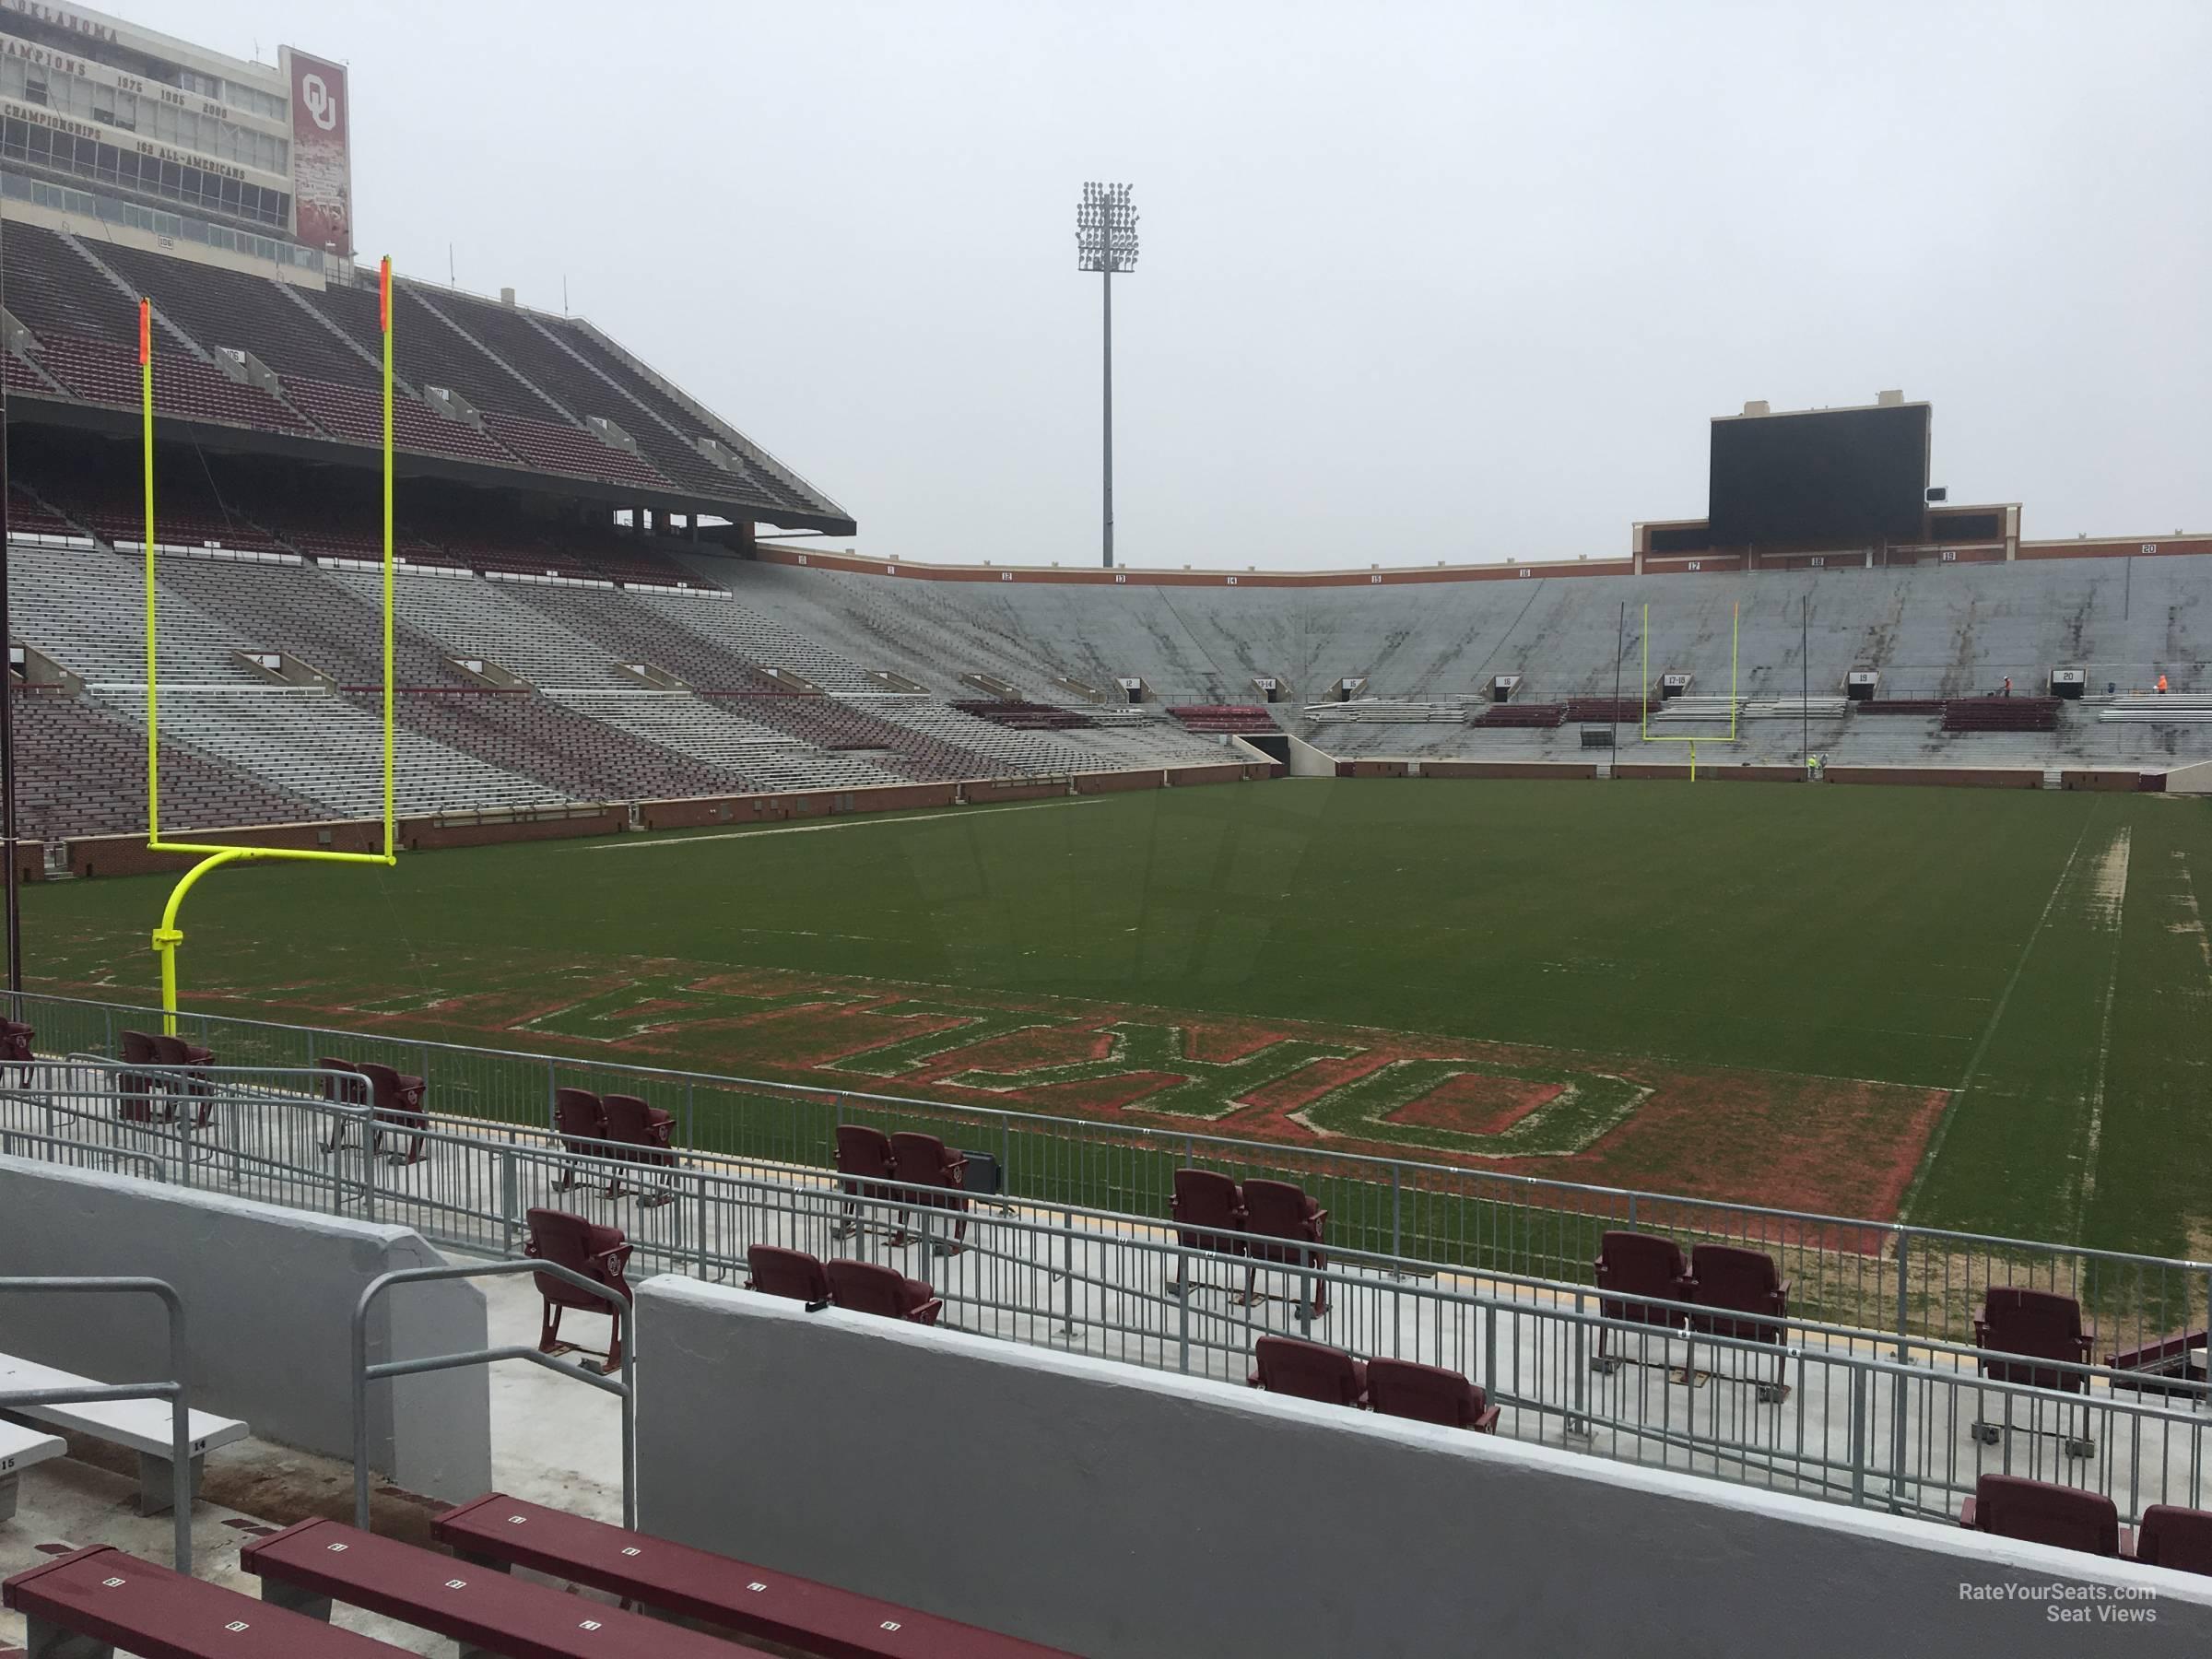 Section 42 At Oklahoma Memorial Stadium Rateyourseats Com